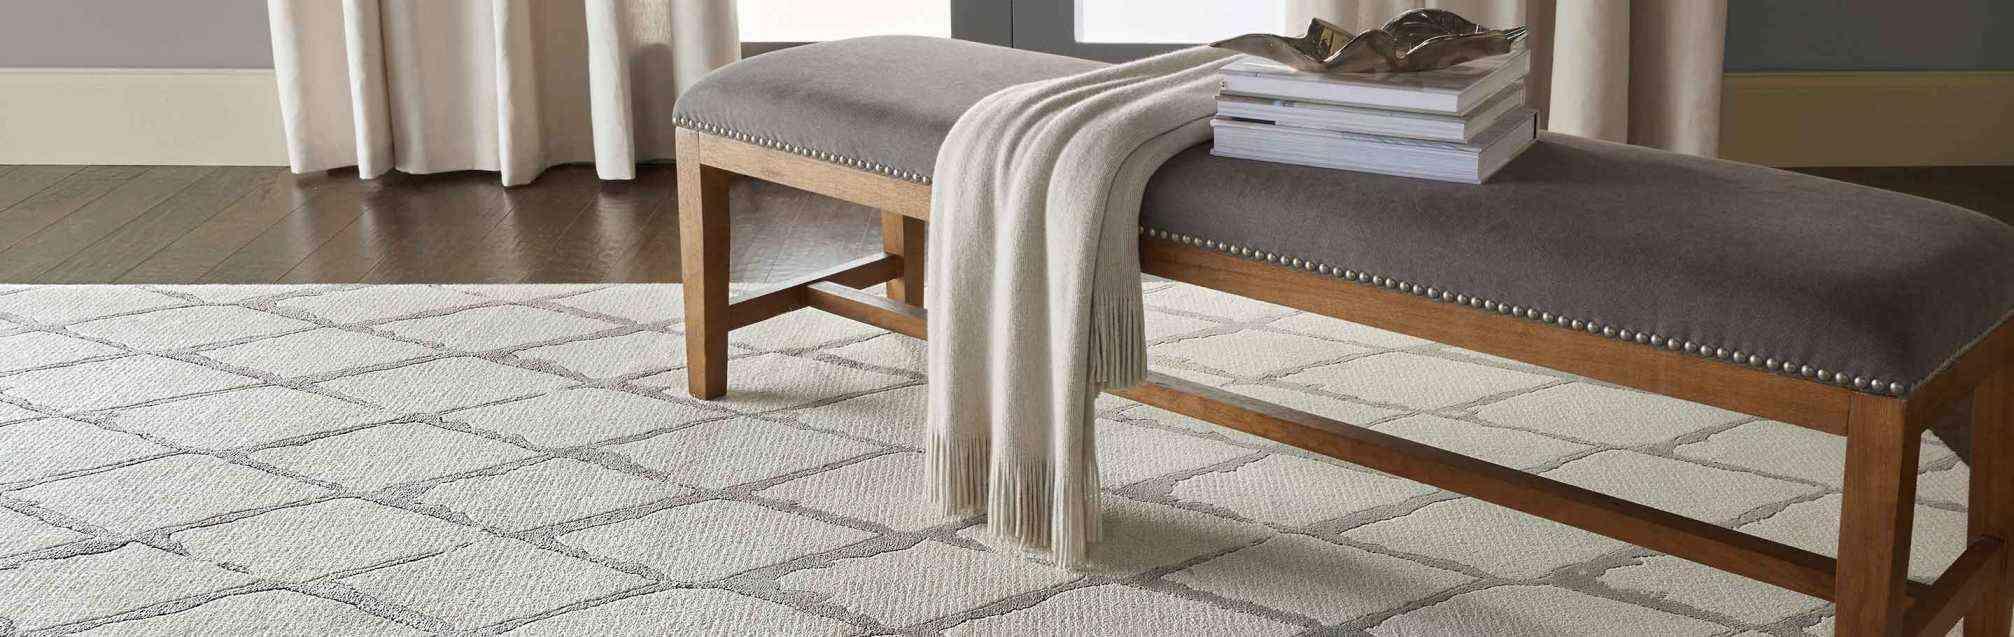 The Rug Gallery Luxury Flooring Amp Design